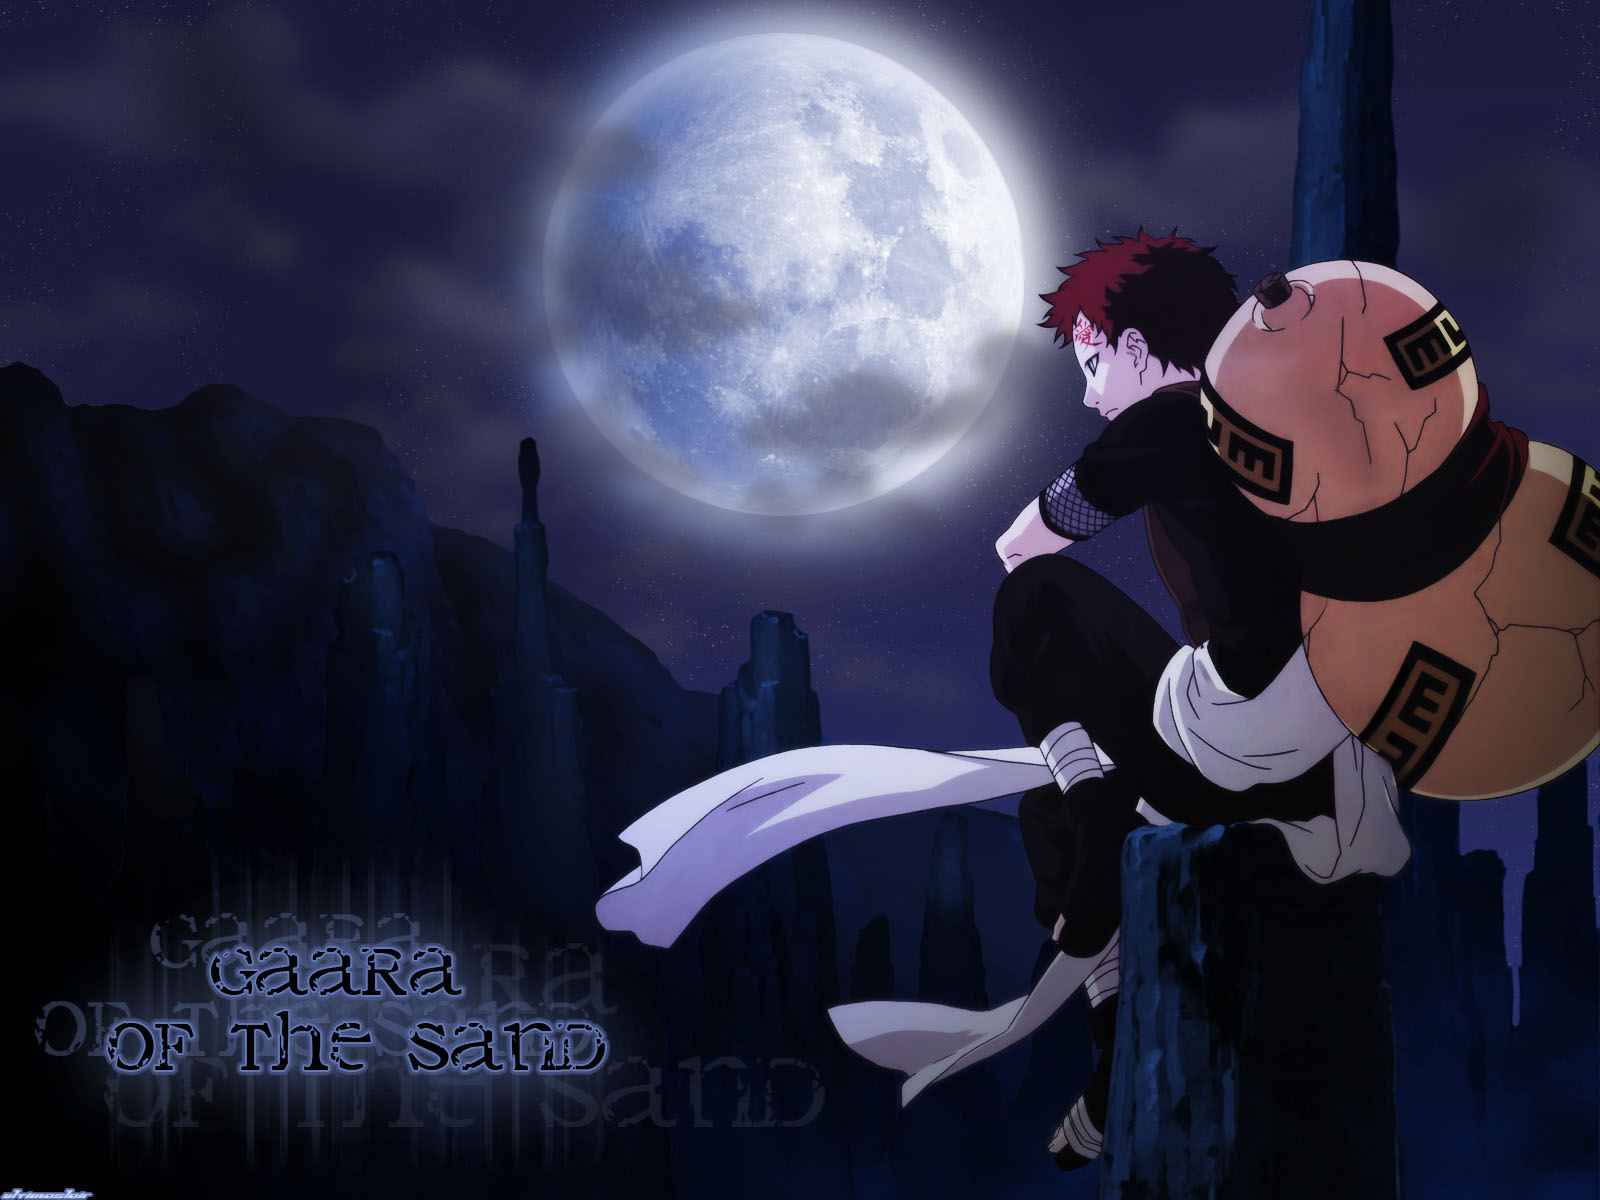 -http://site.anime.web.tr/dosyalar/resim/gaara/gaara5.jpg